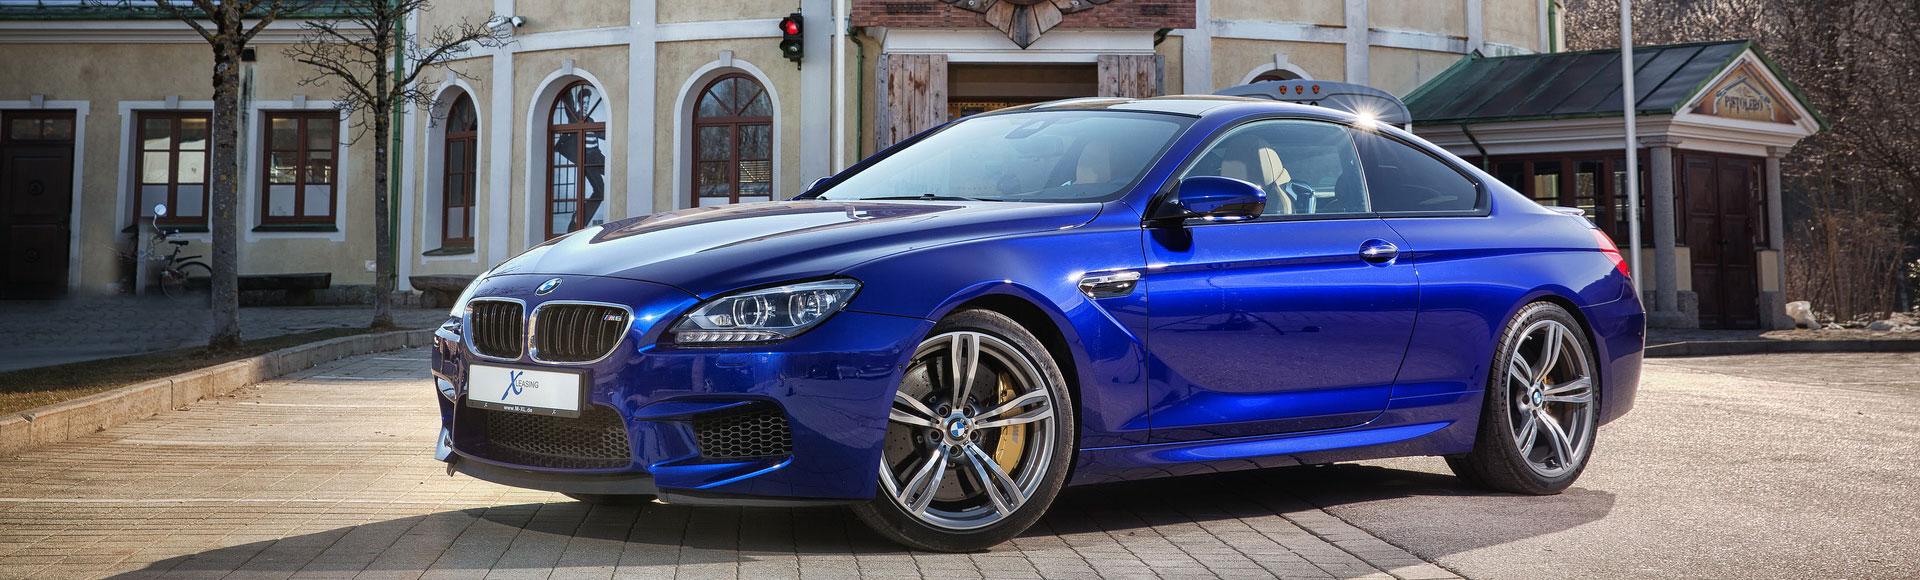 BMW M6 Coupe 2013 blau spring winter 1652